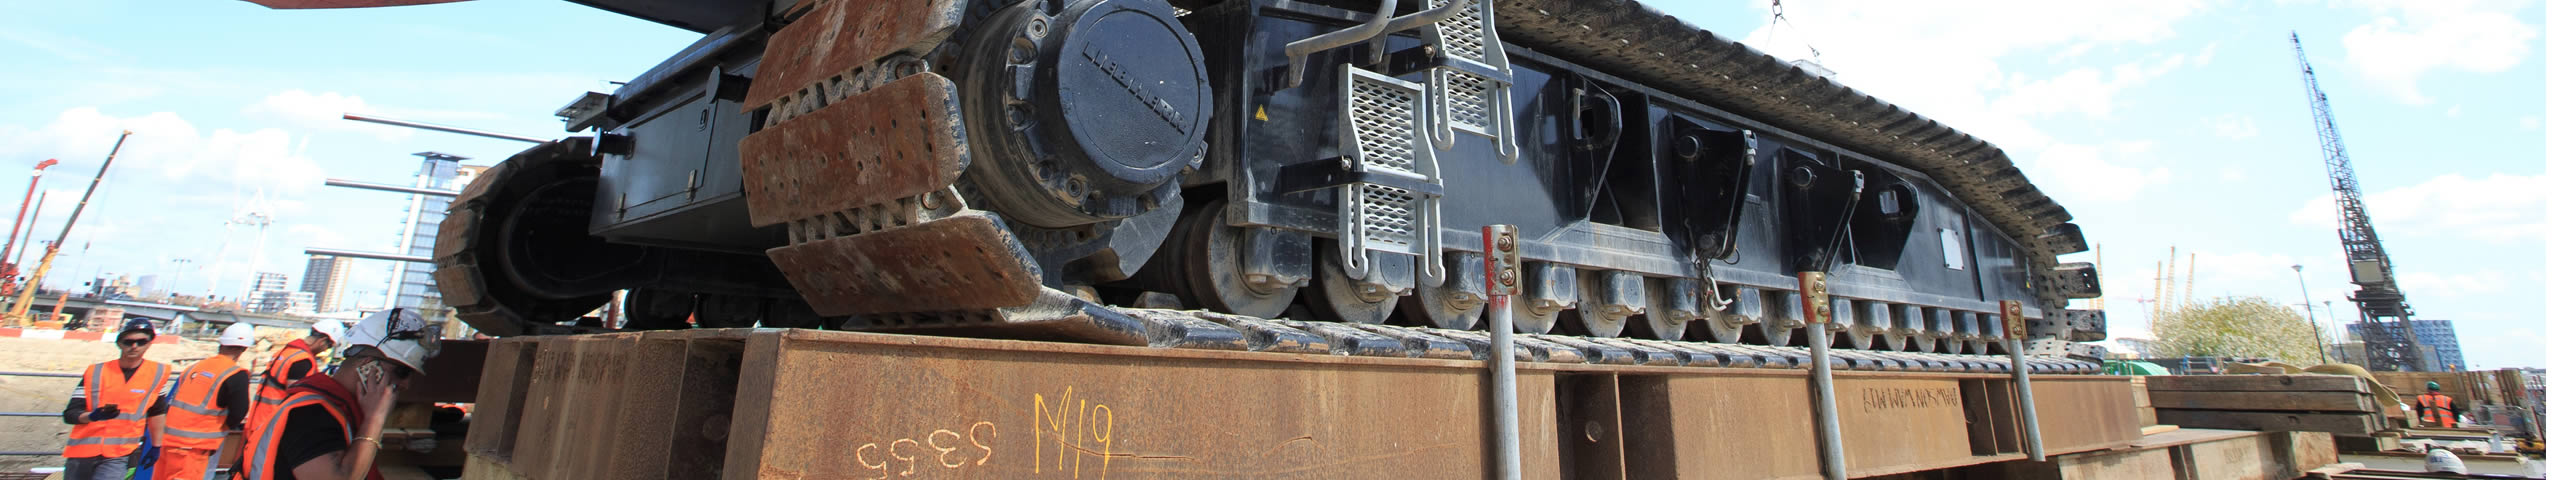 Steel Mat Hire